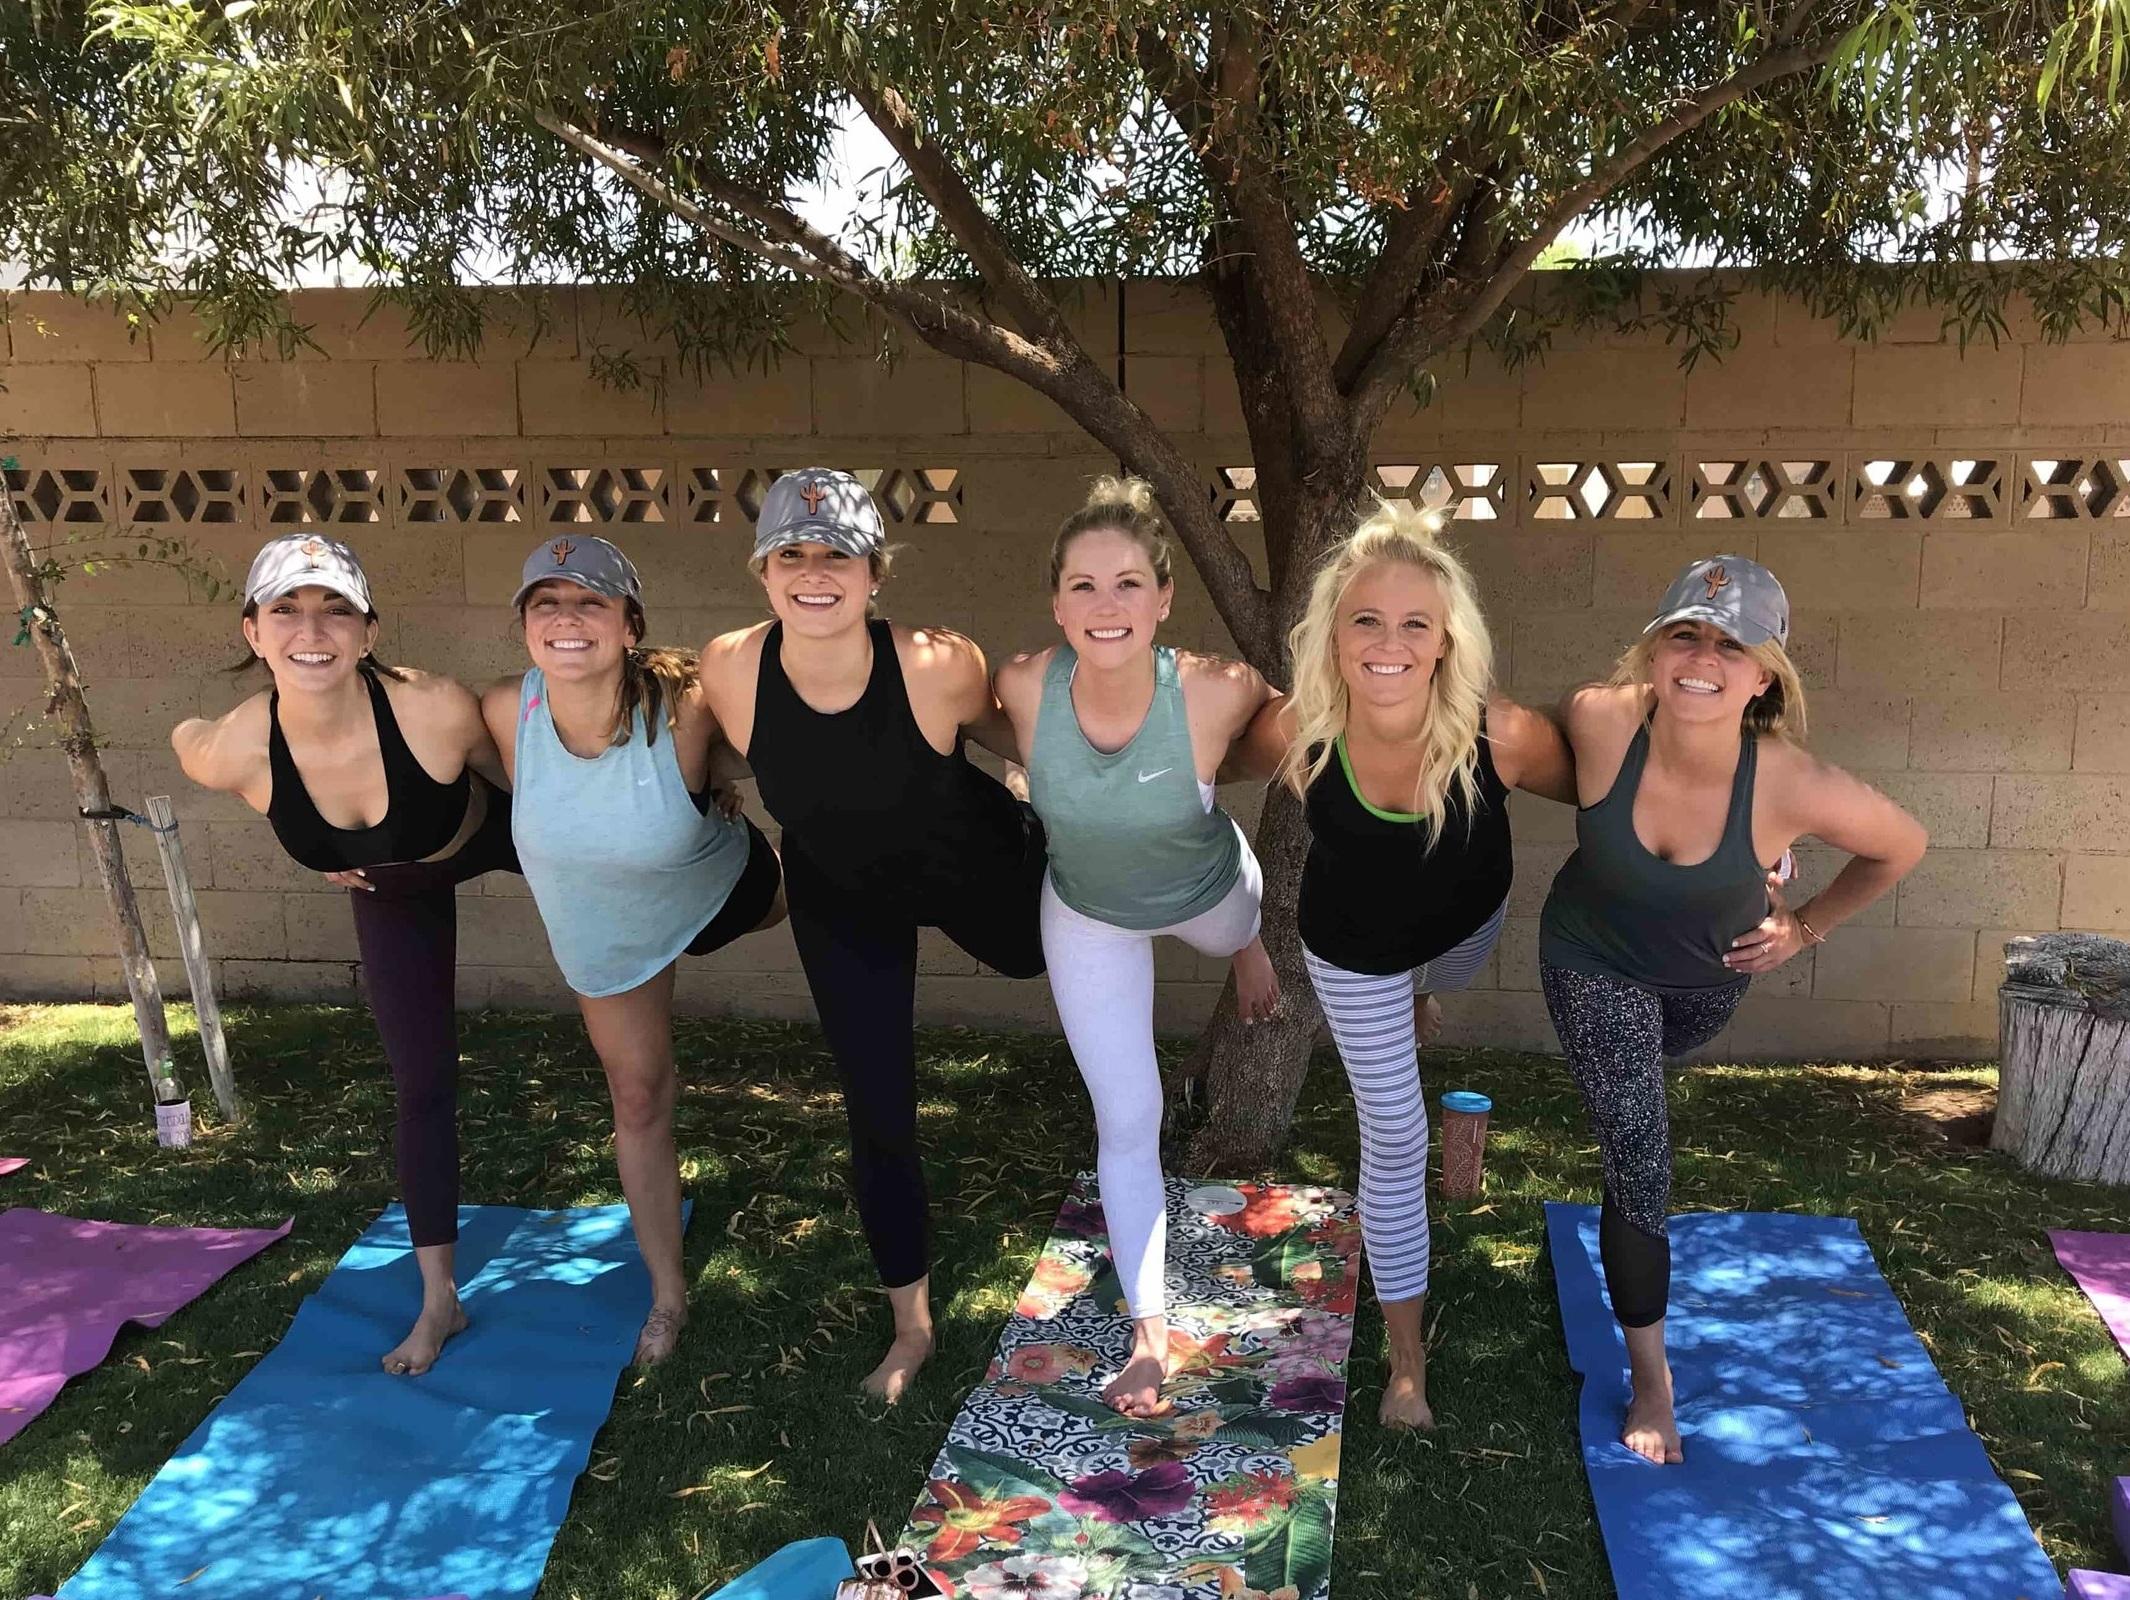 private yoga classes for bachelorette parties in Scottsdale, AZ